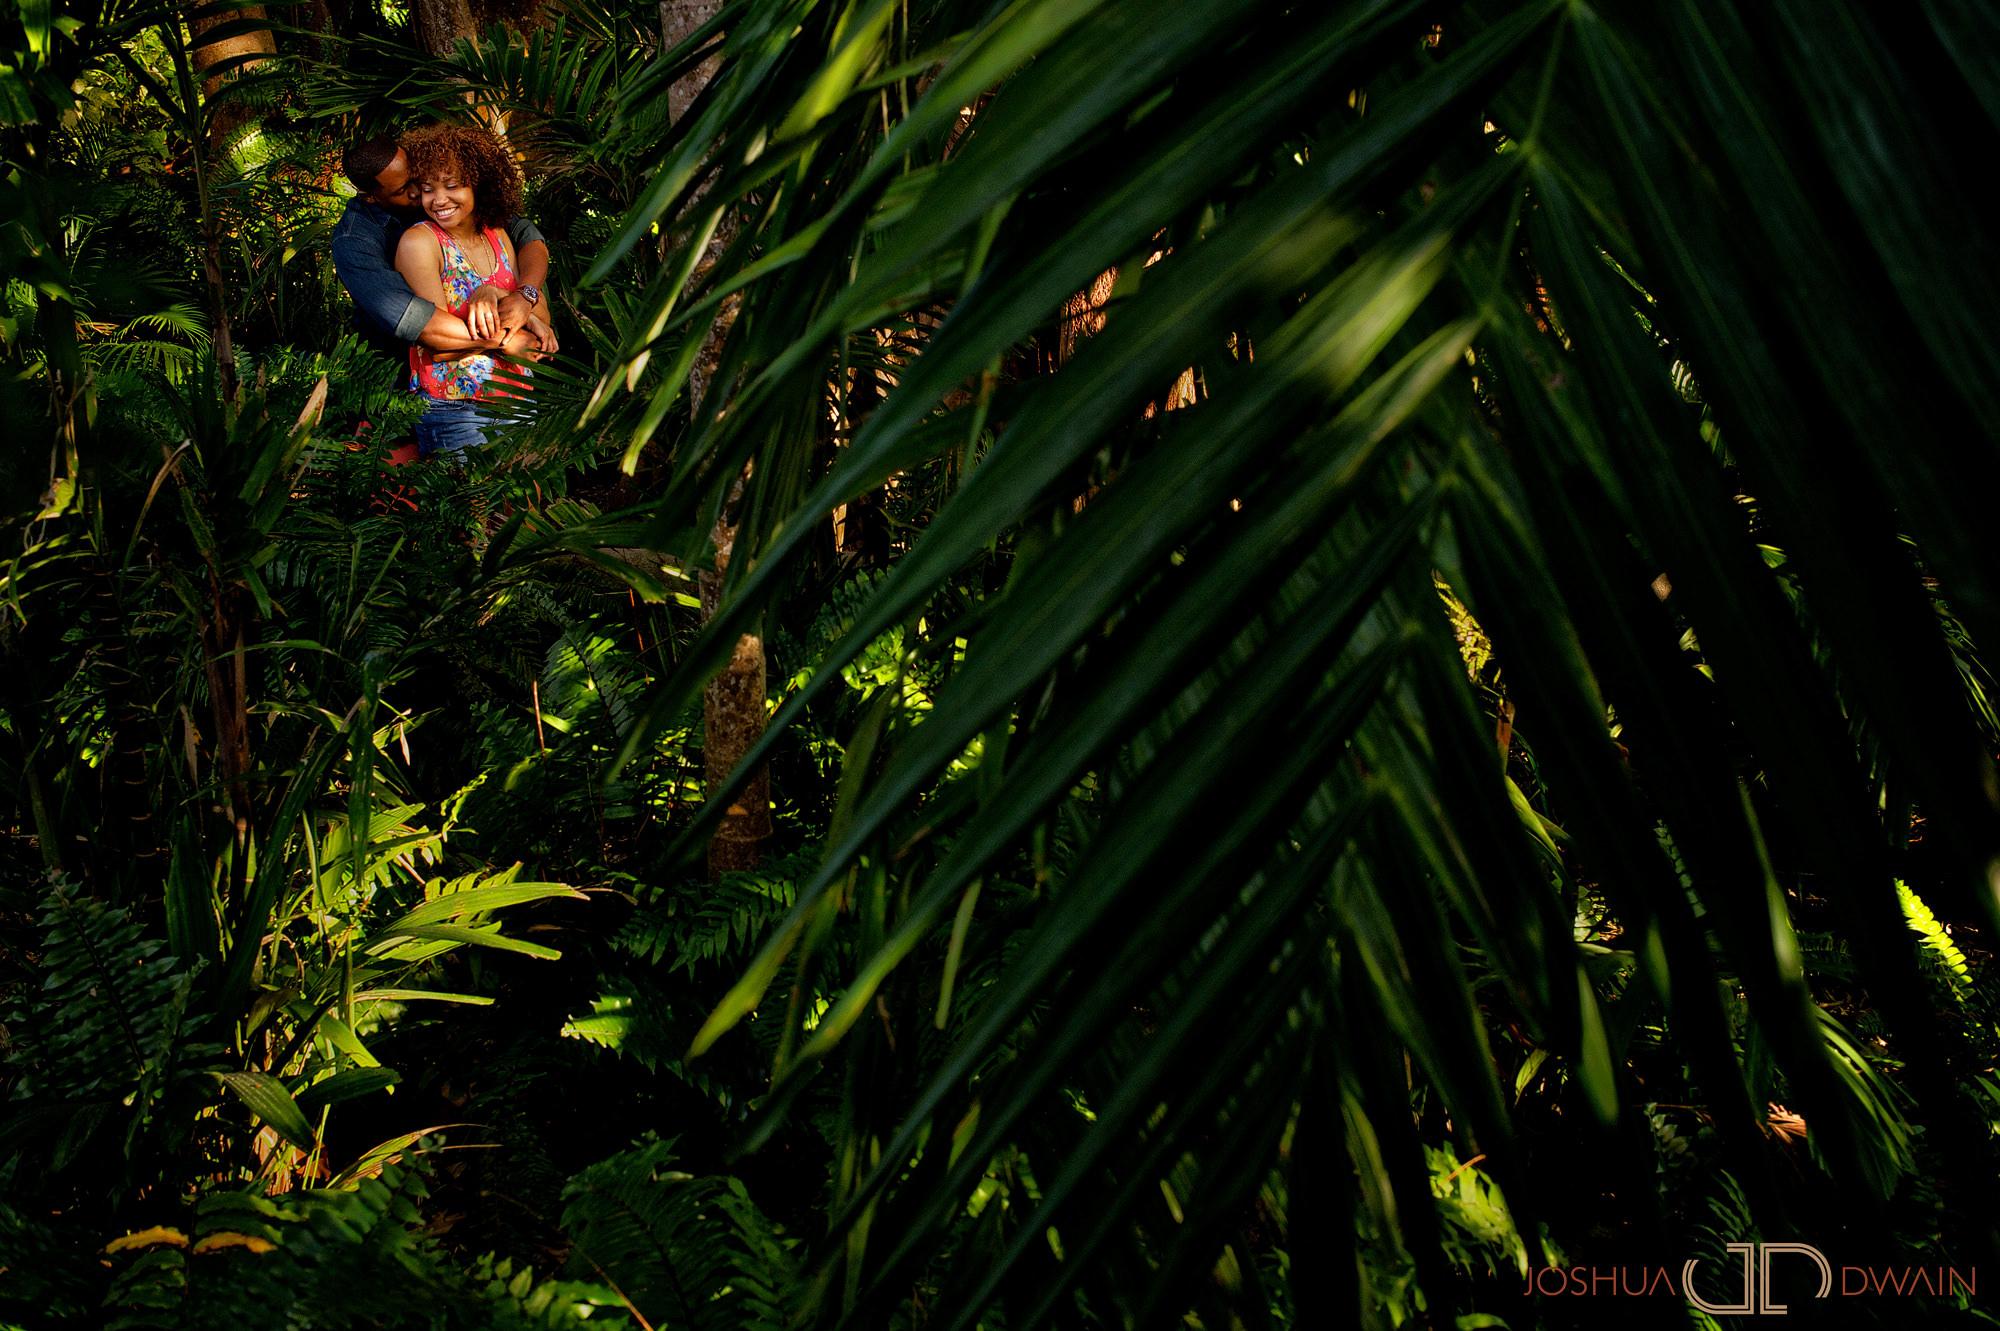 danielle-dowani-011-vizcaya-museum-gardens-miami-florida-wedding-photographer-joshua-dwain